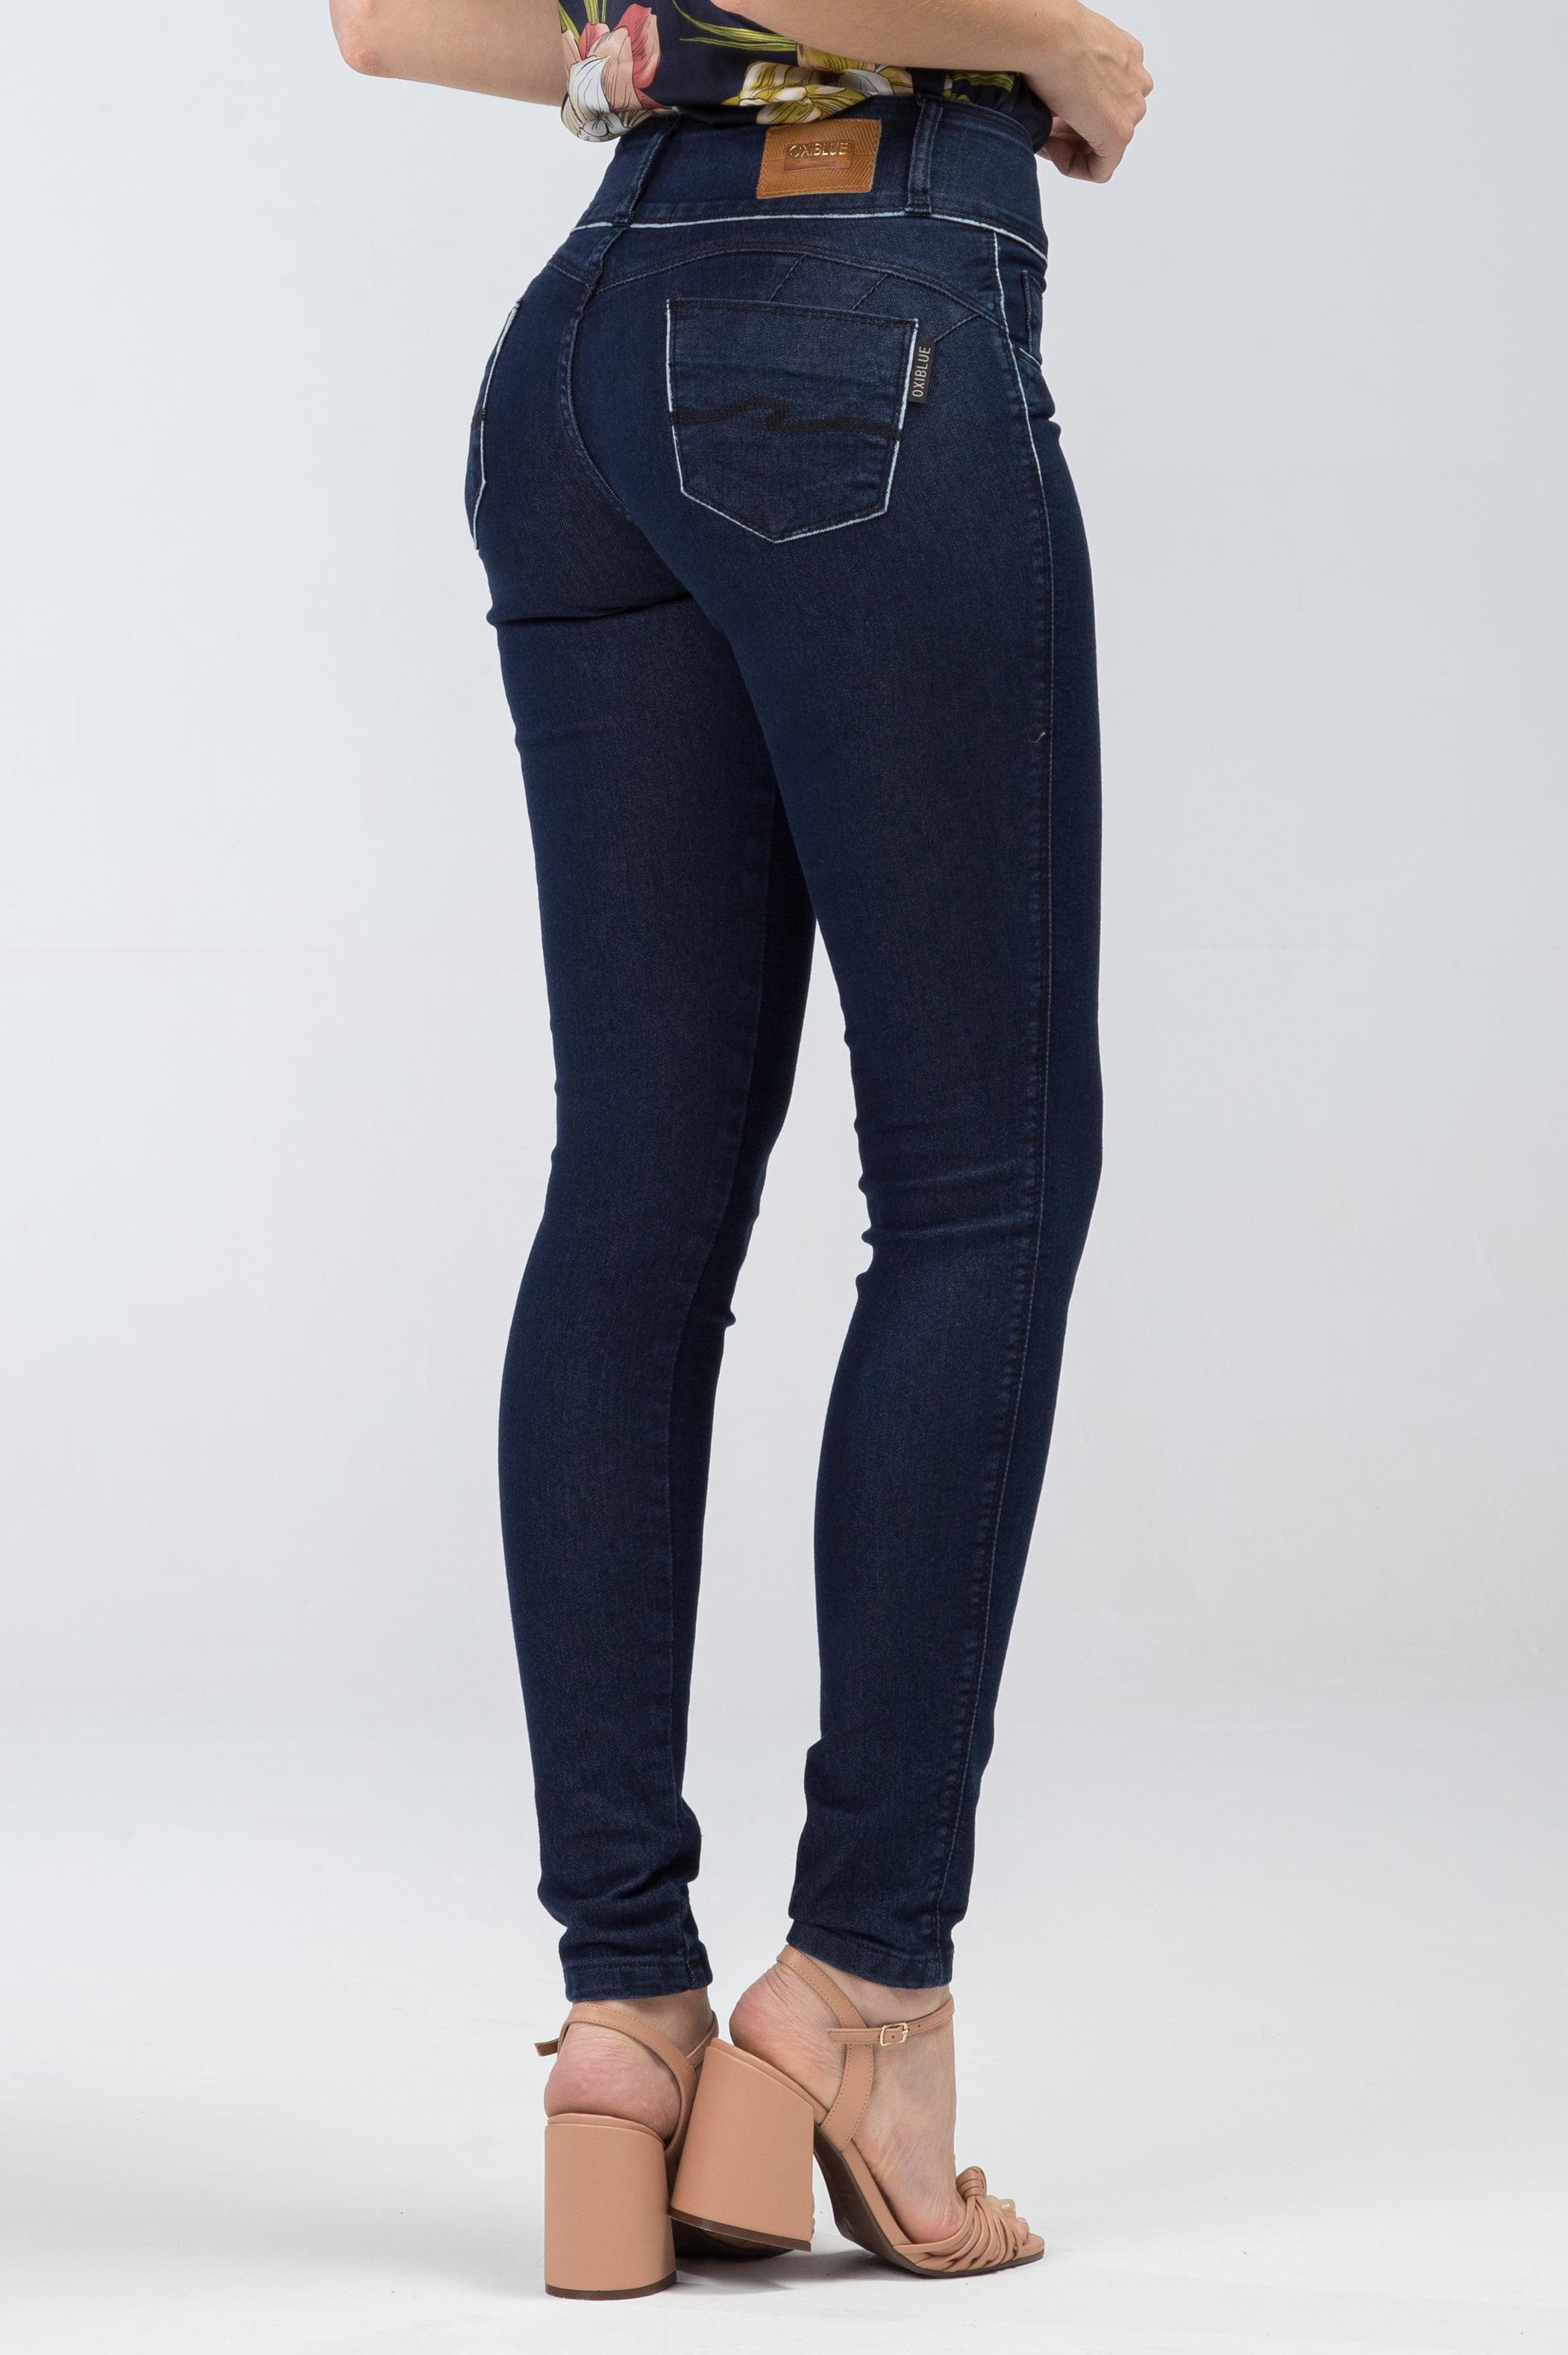 Calça Jeans Feminina Skinny F2020250